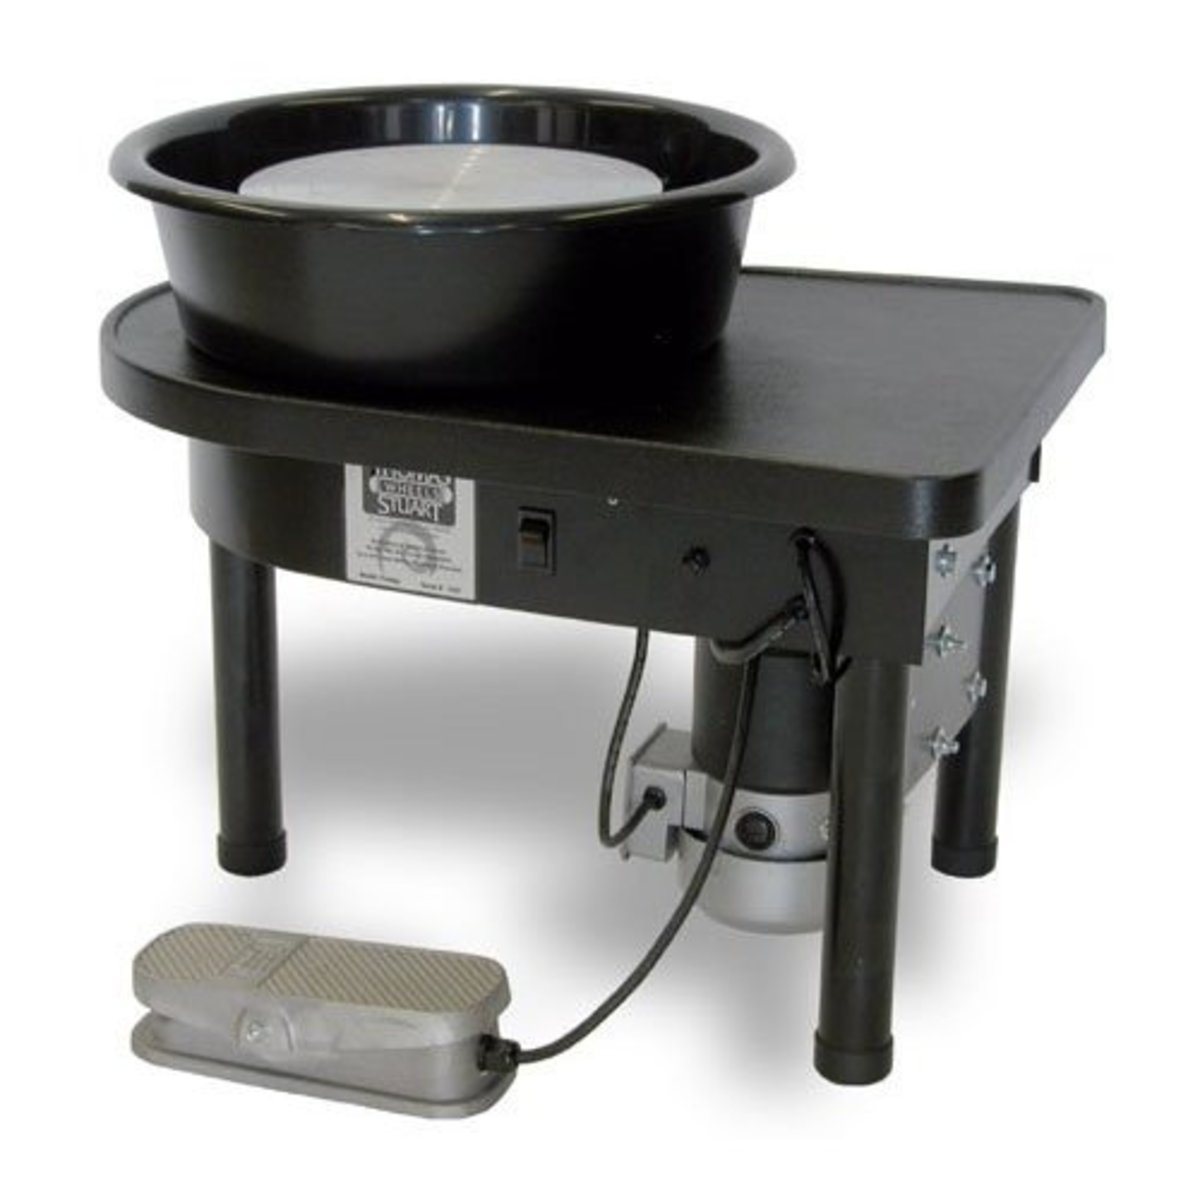 A Modern Pottery Wheel - Electric. Image Credit: Amazon.com